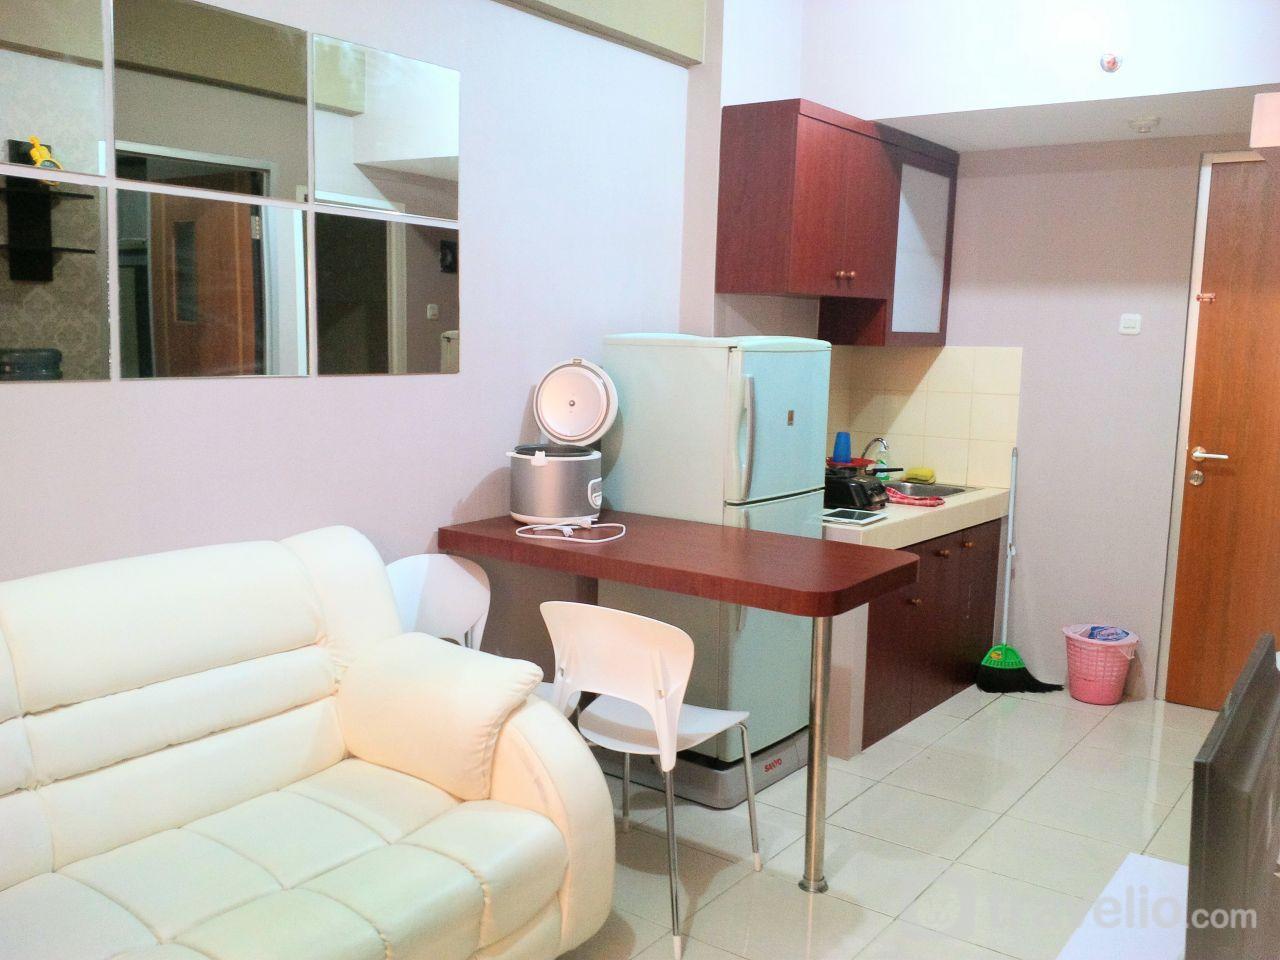 Apartemen Puncak Permai - Apartment Puncak Permai - 2 Bedroom I